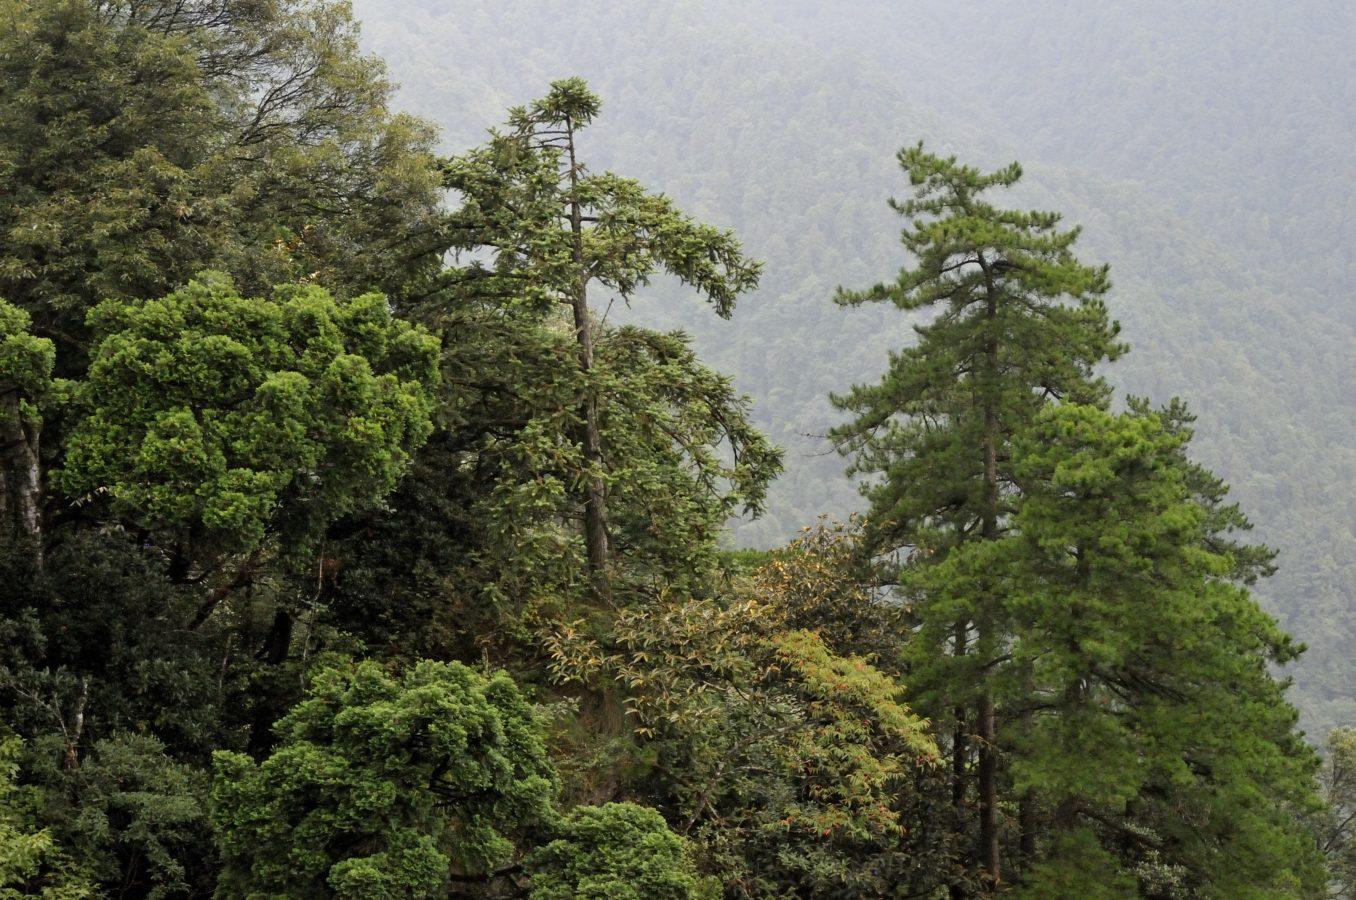 Bijia Shan, Jiangxi (with Cunninghamia lanceolata & Pinus hwangshanensis)